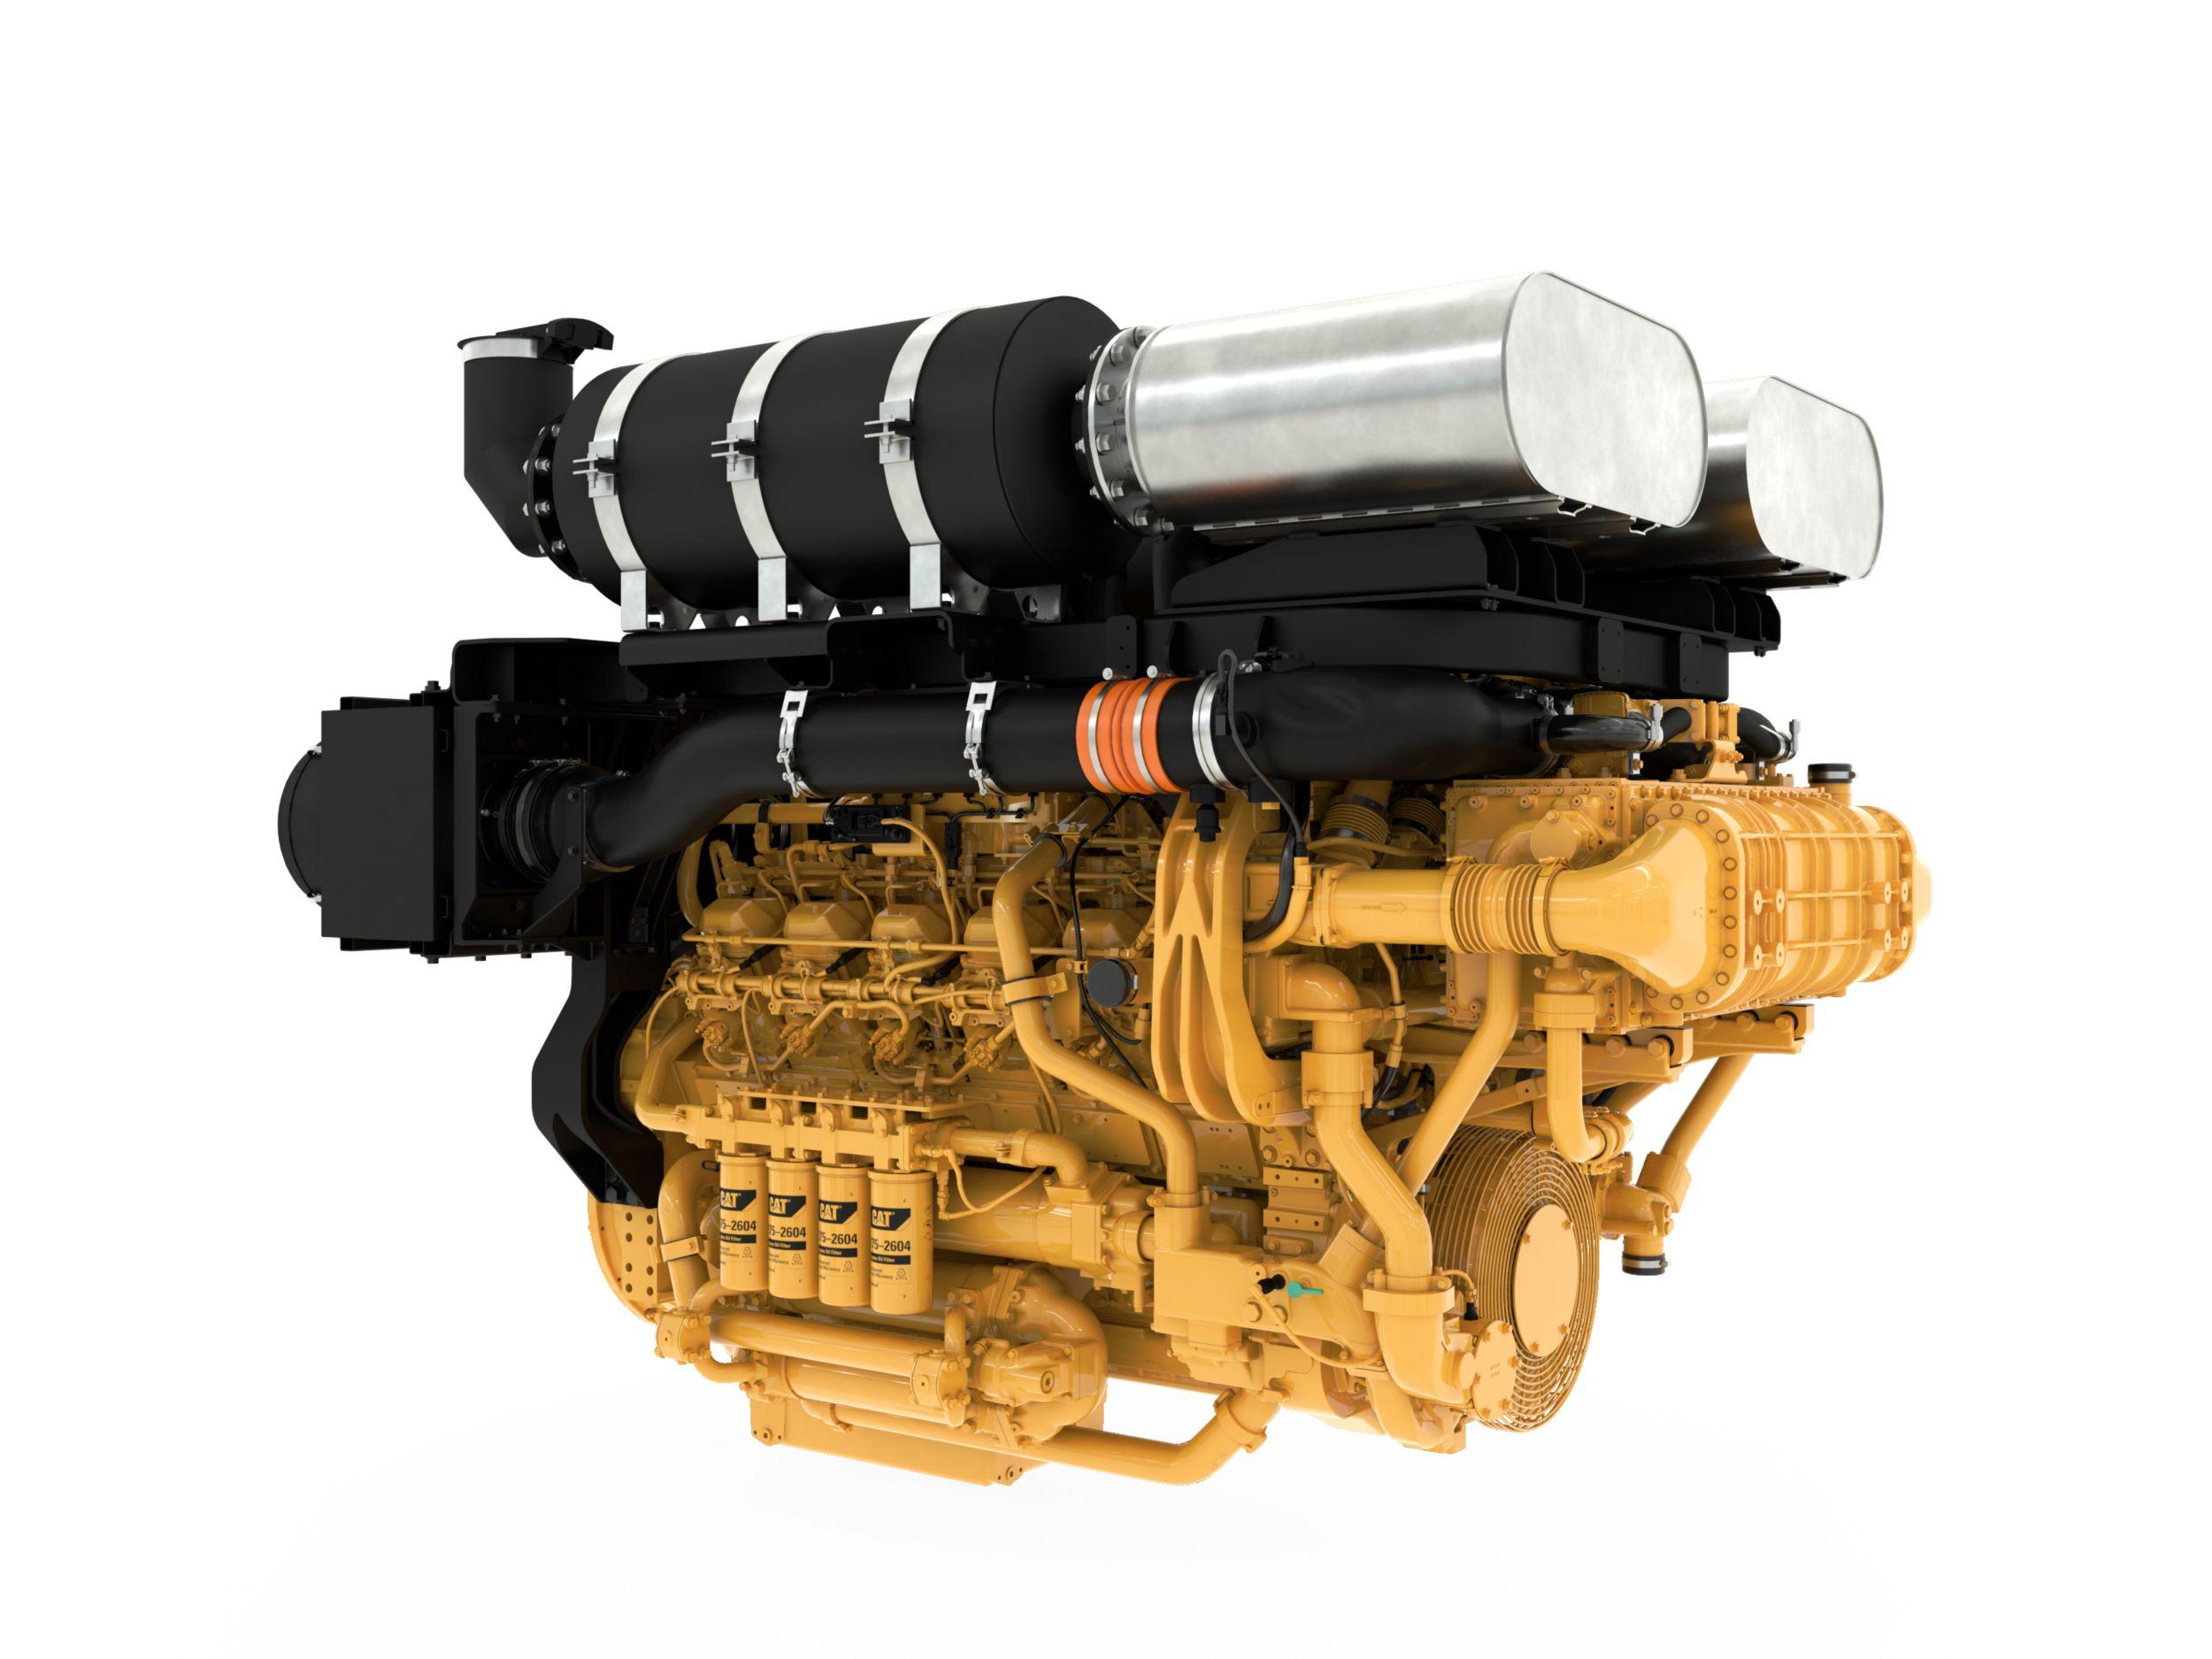 Diesel Progress >175 hp Engine of the Year